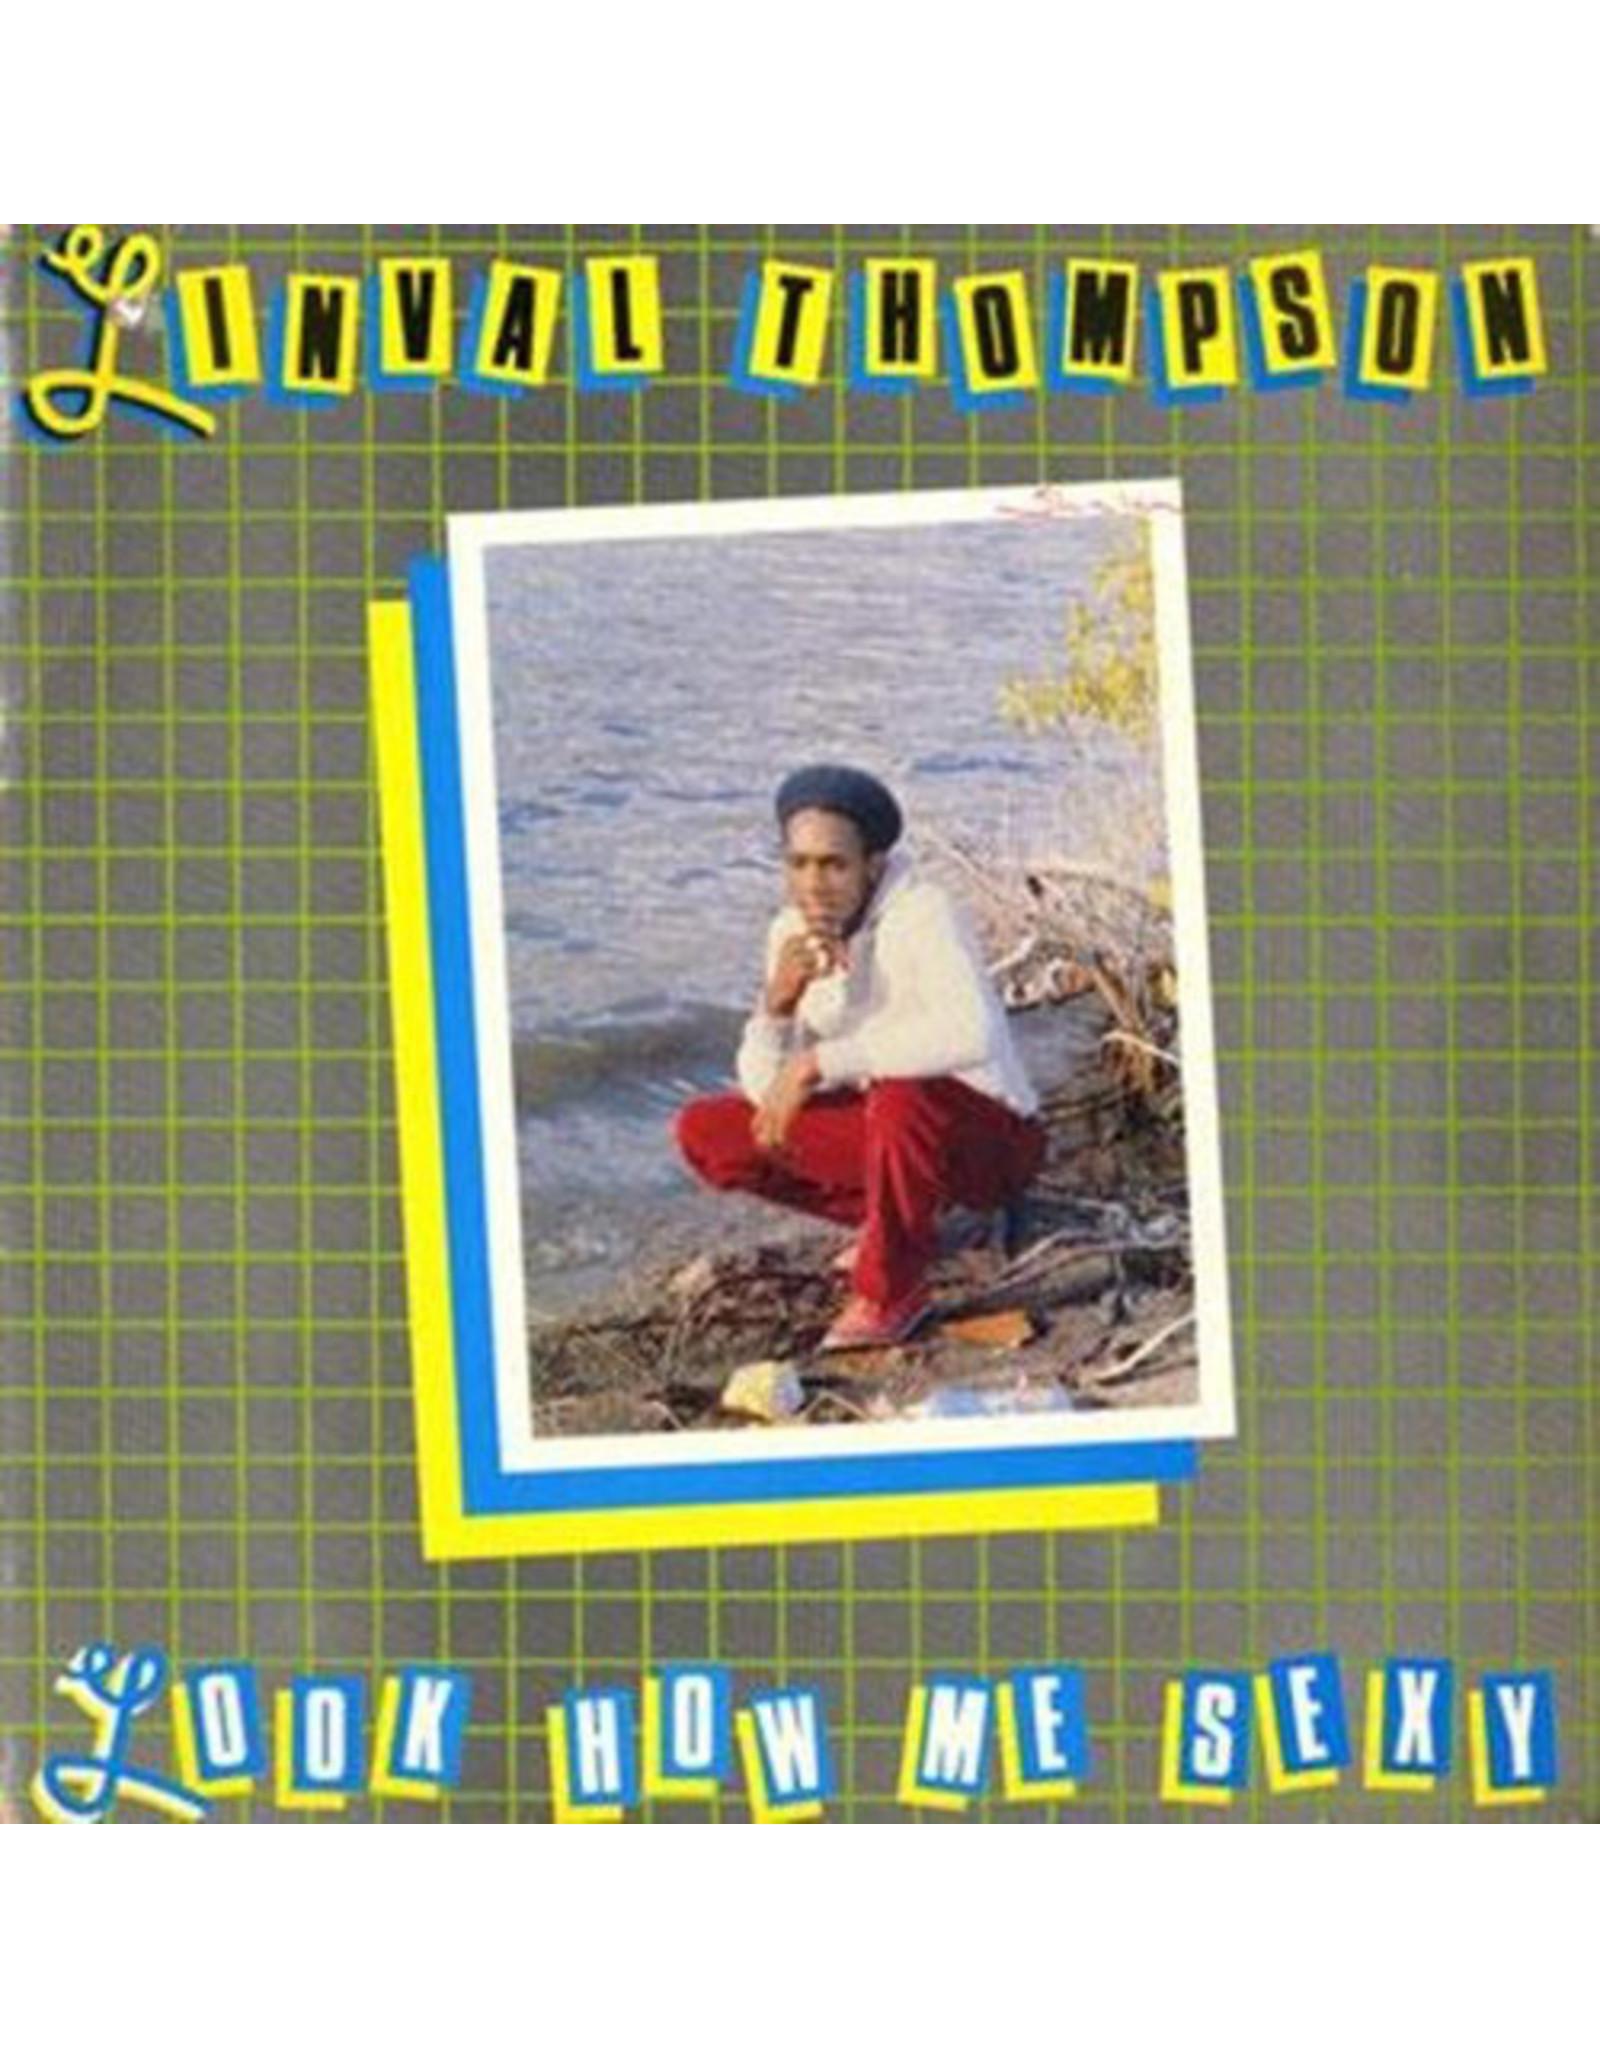 New Vinyl Linval Thompson - Look How Me Sexy LP